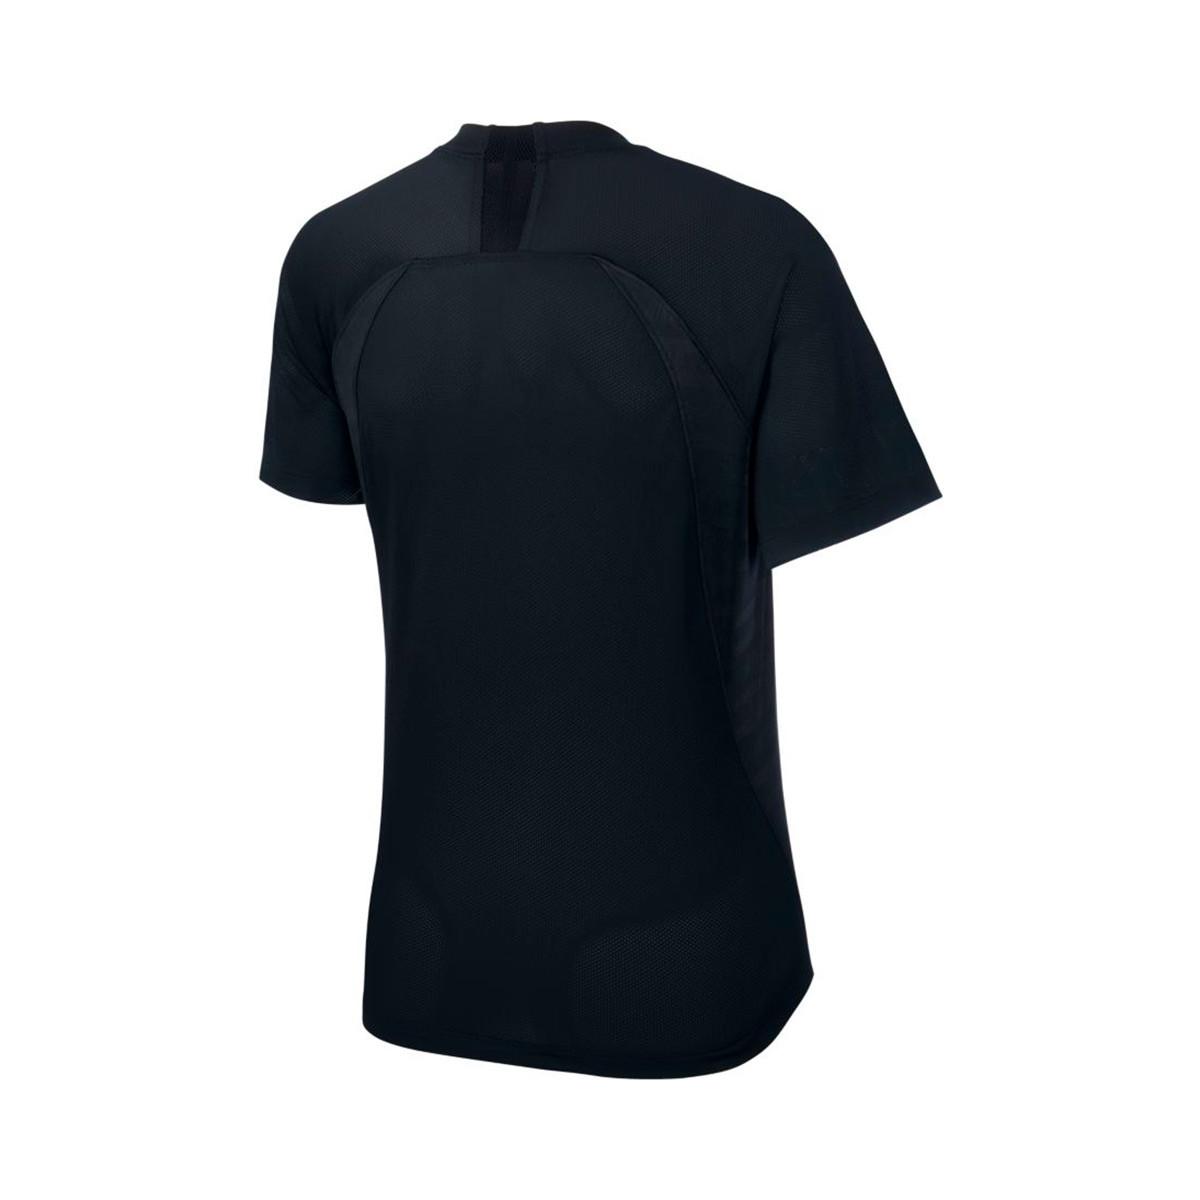 Nike FC Dry Tee Black